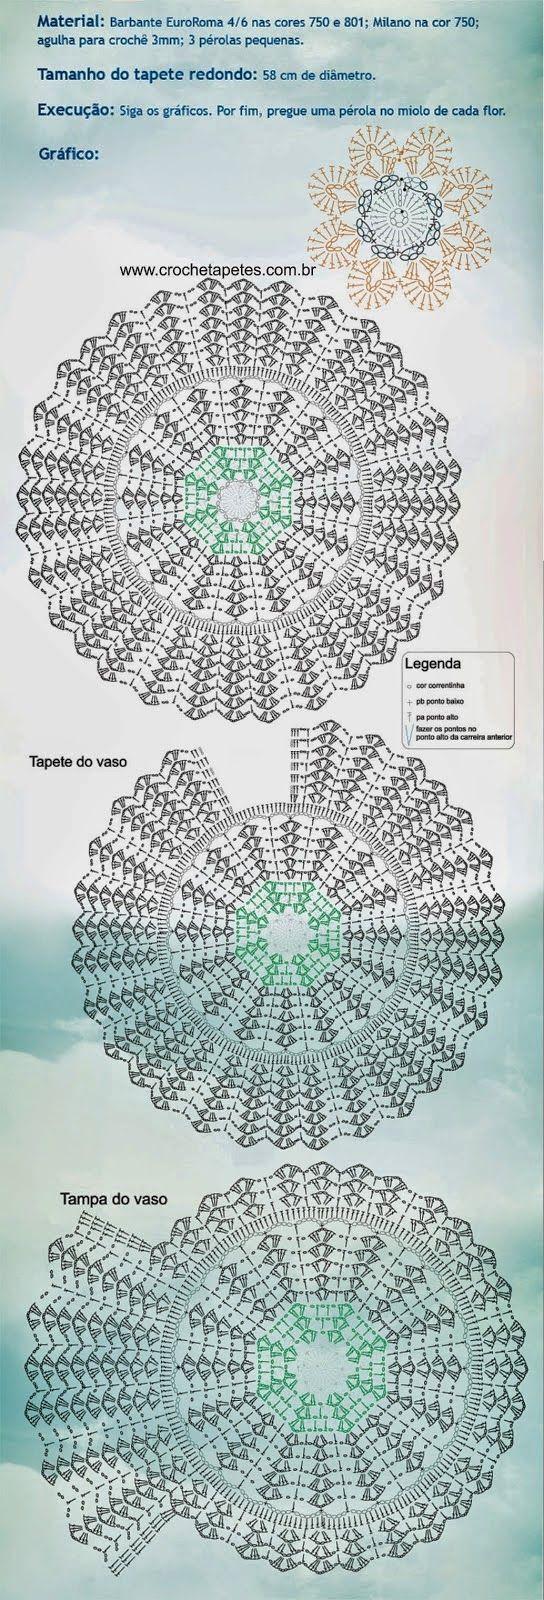 Grfico Ganchillo Pinterest Crochet Patterns And Doilies Oval Doily Diagram Mandala